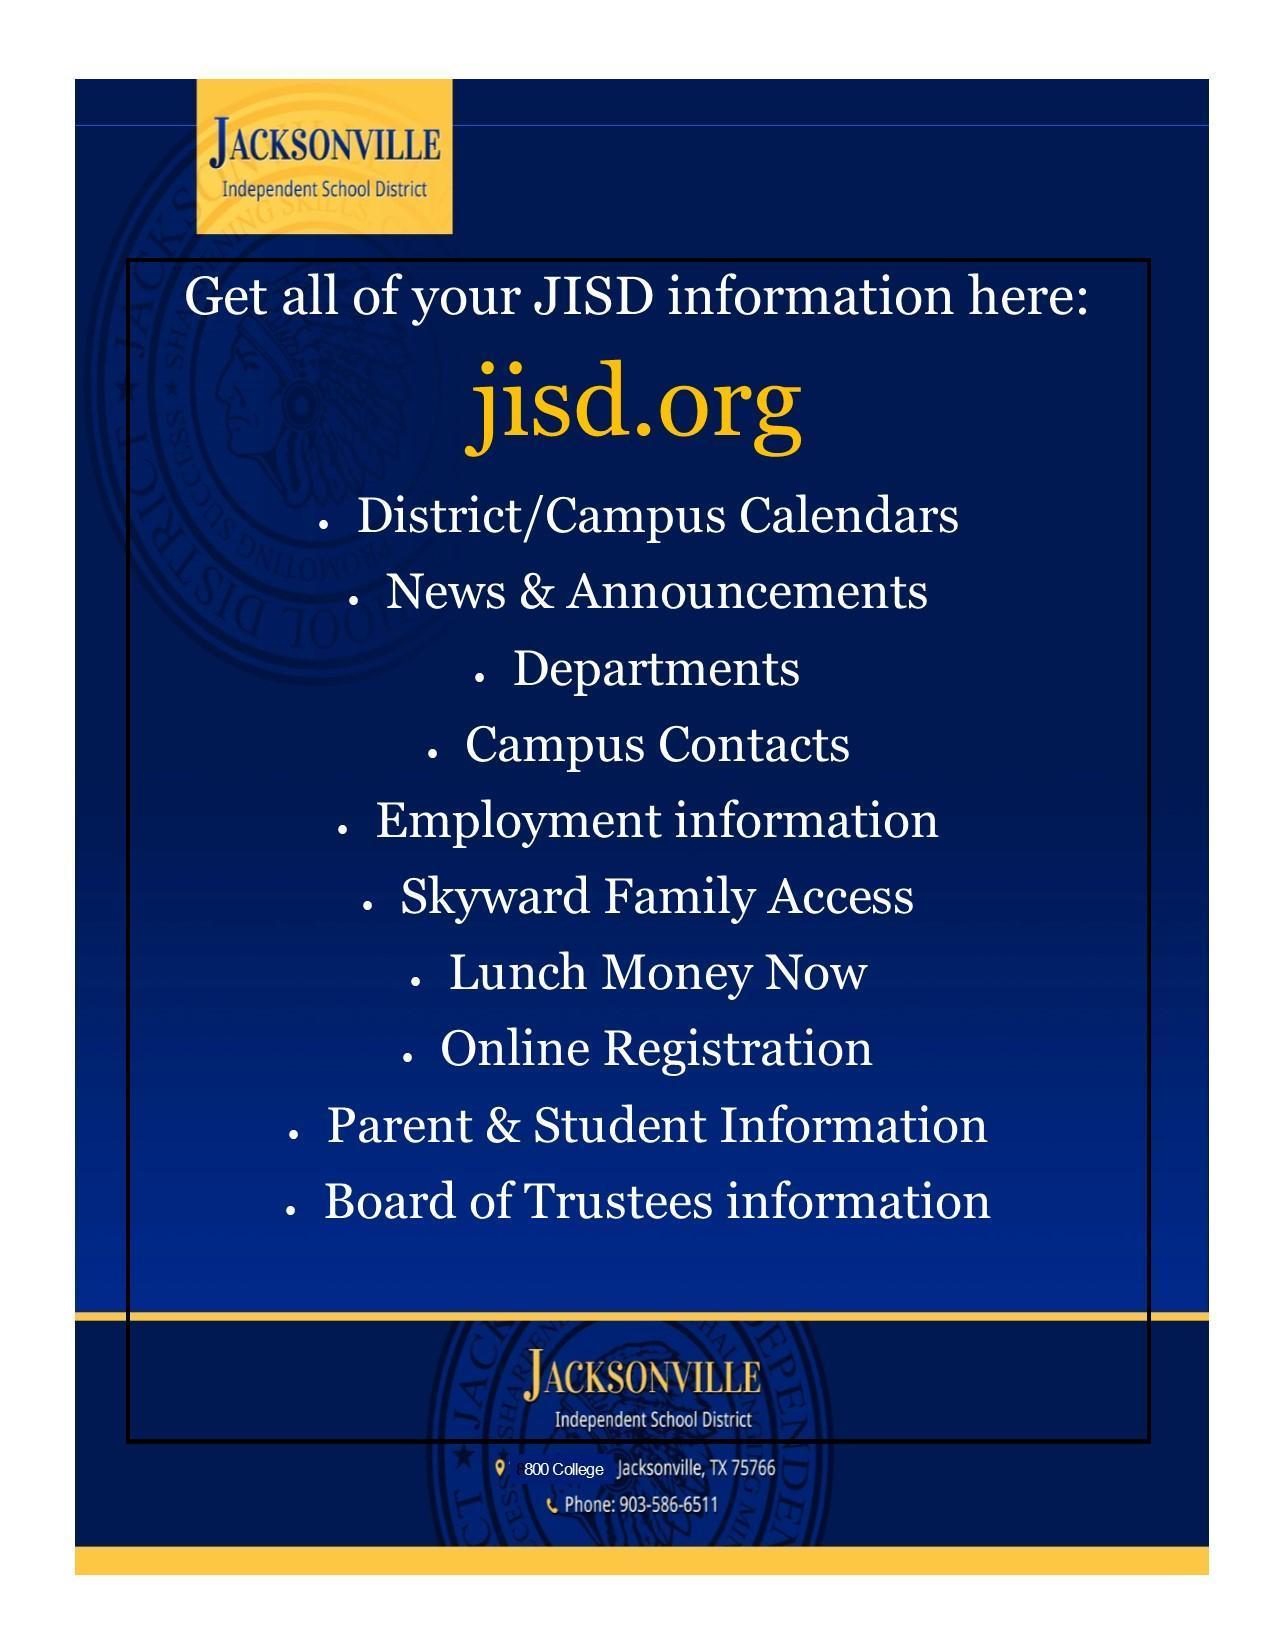 things found on the jisd website